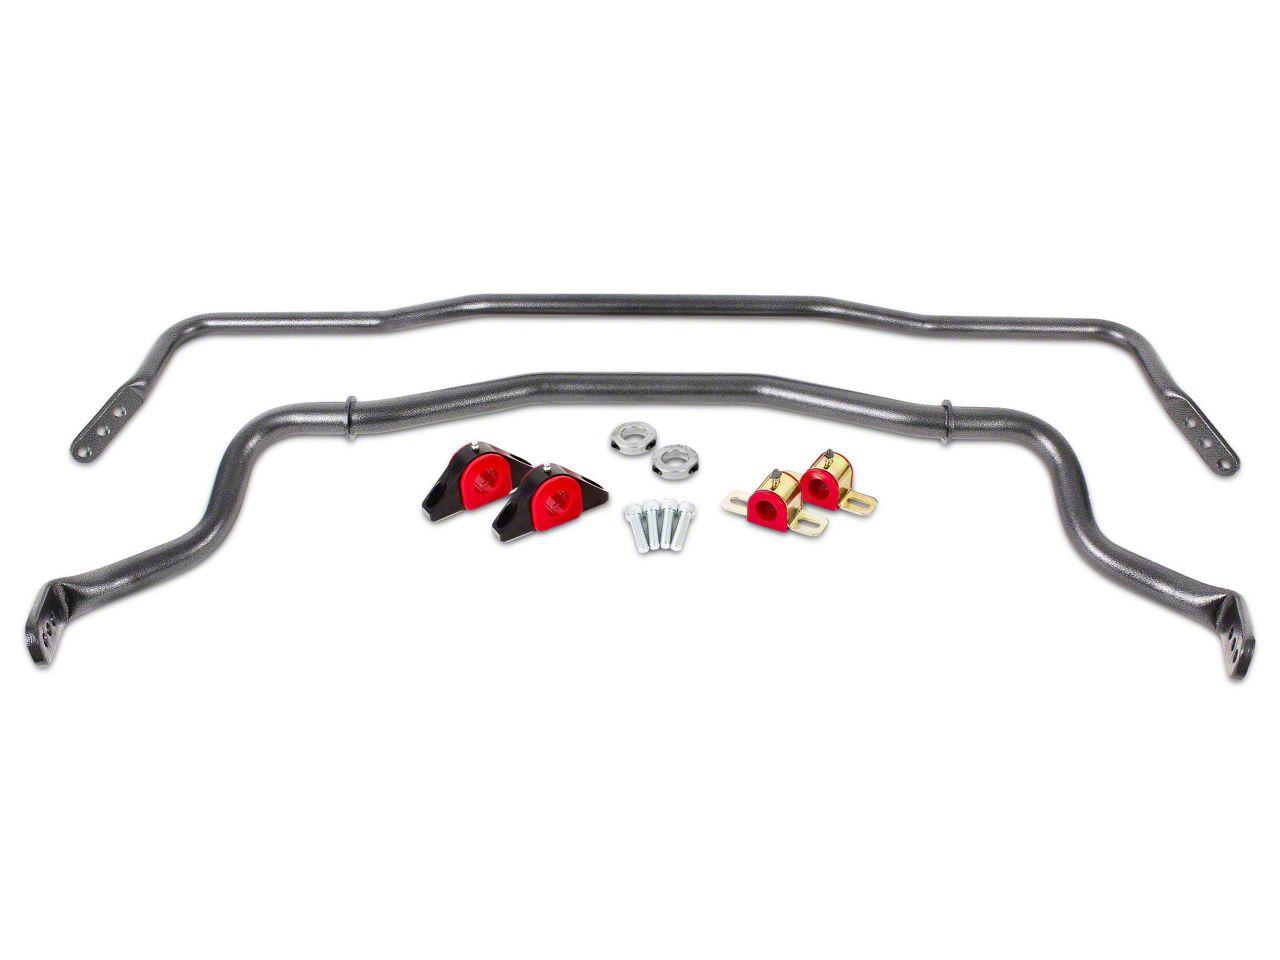 BMR Adjustable Front & Rear Sway Bars - Hammertone (15-19 All)